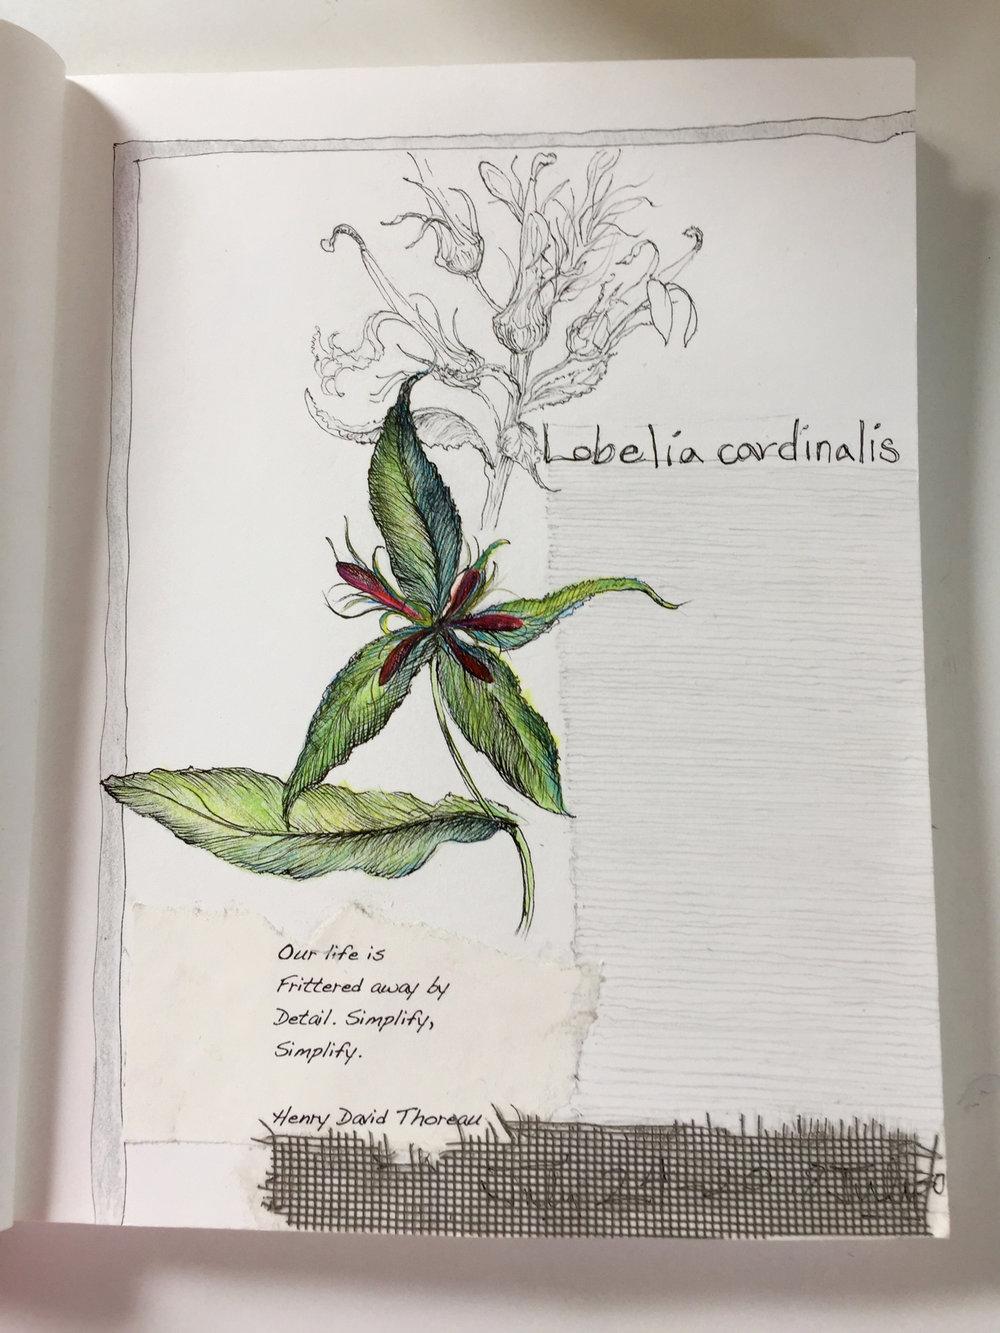 Sitting with Lobelia cardinalis & sketching